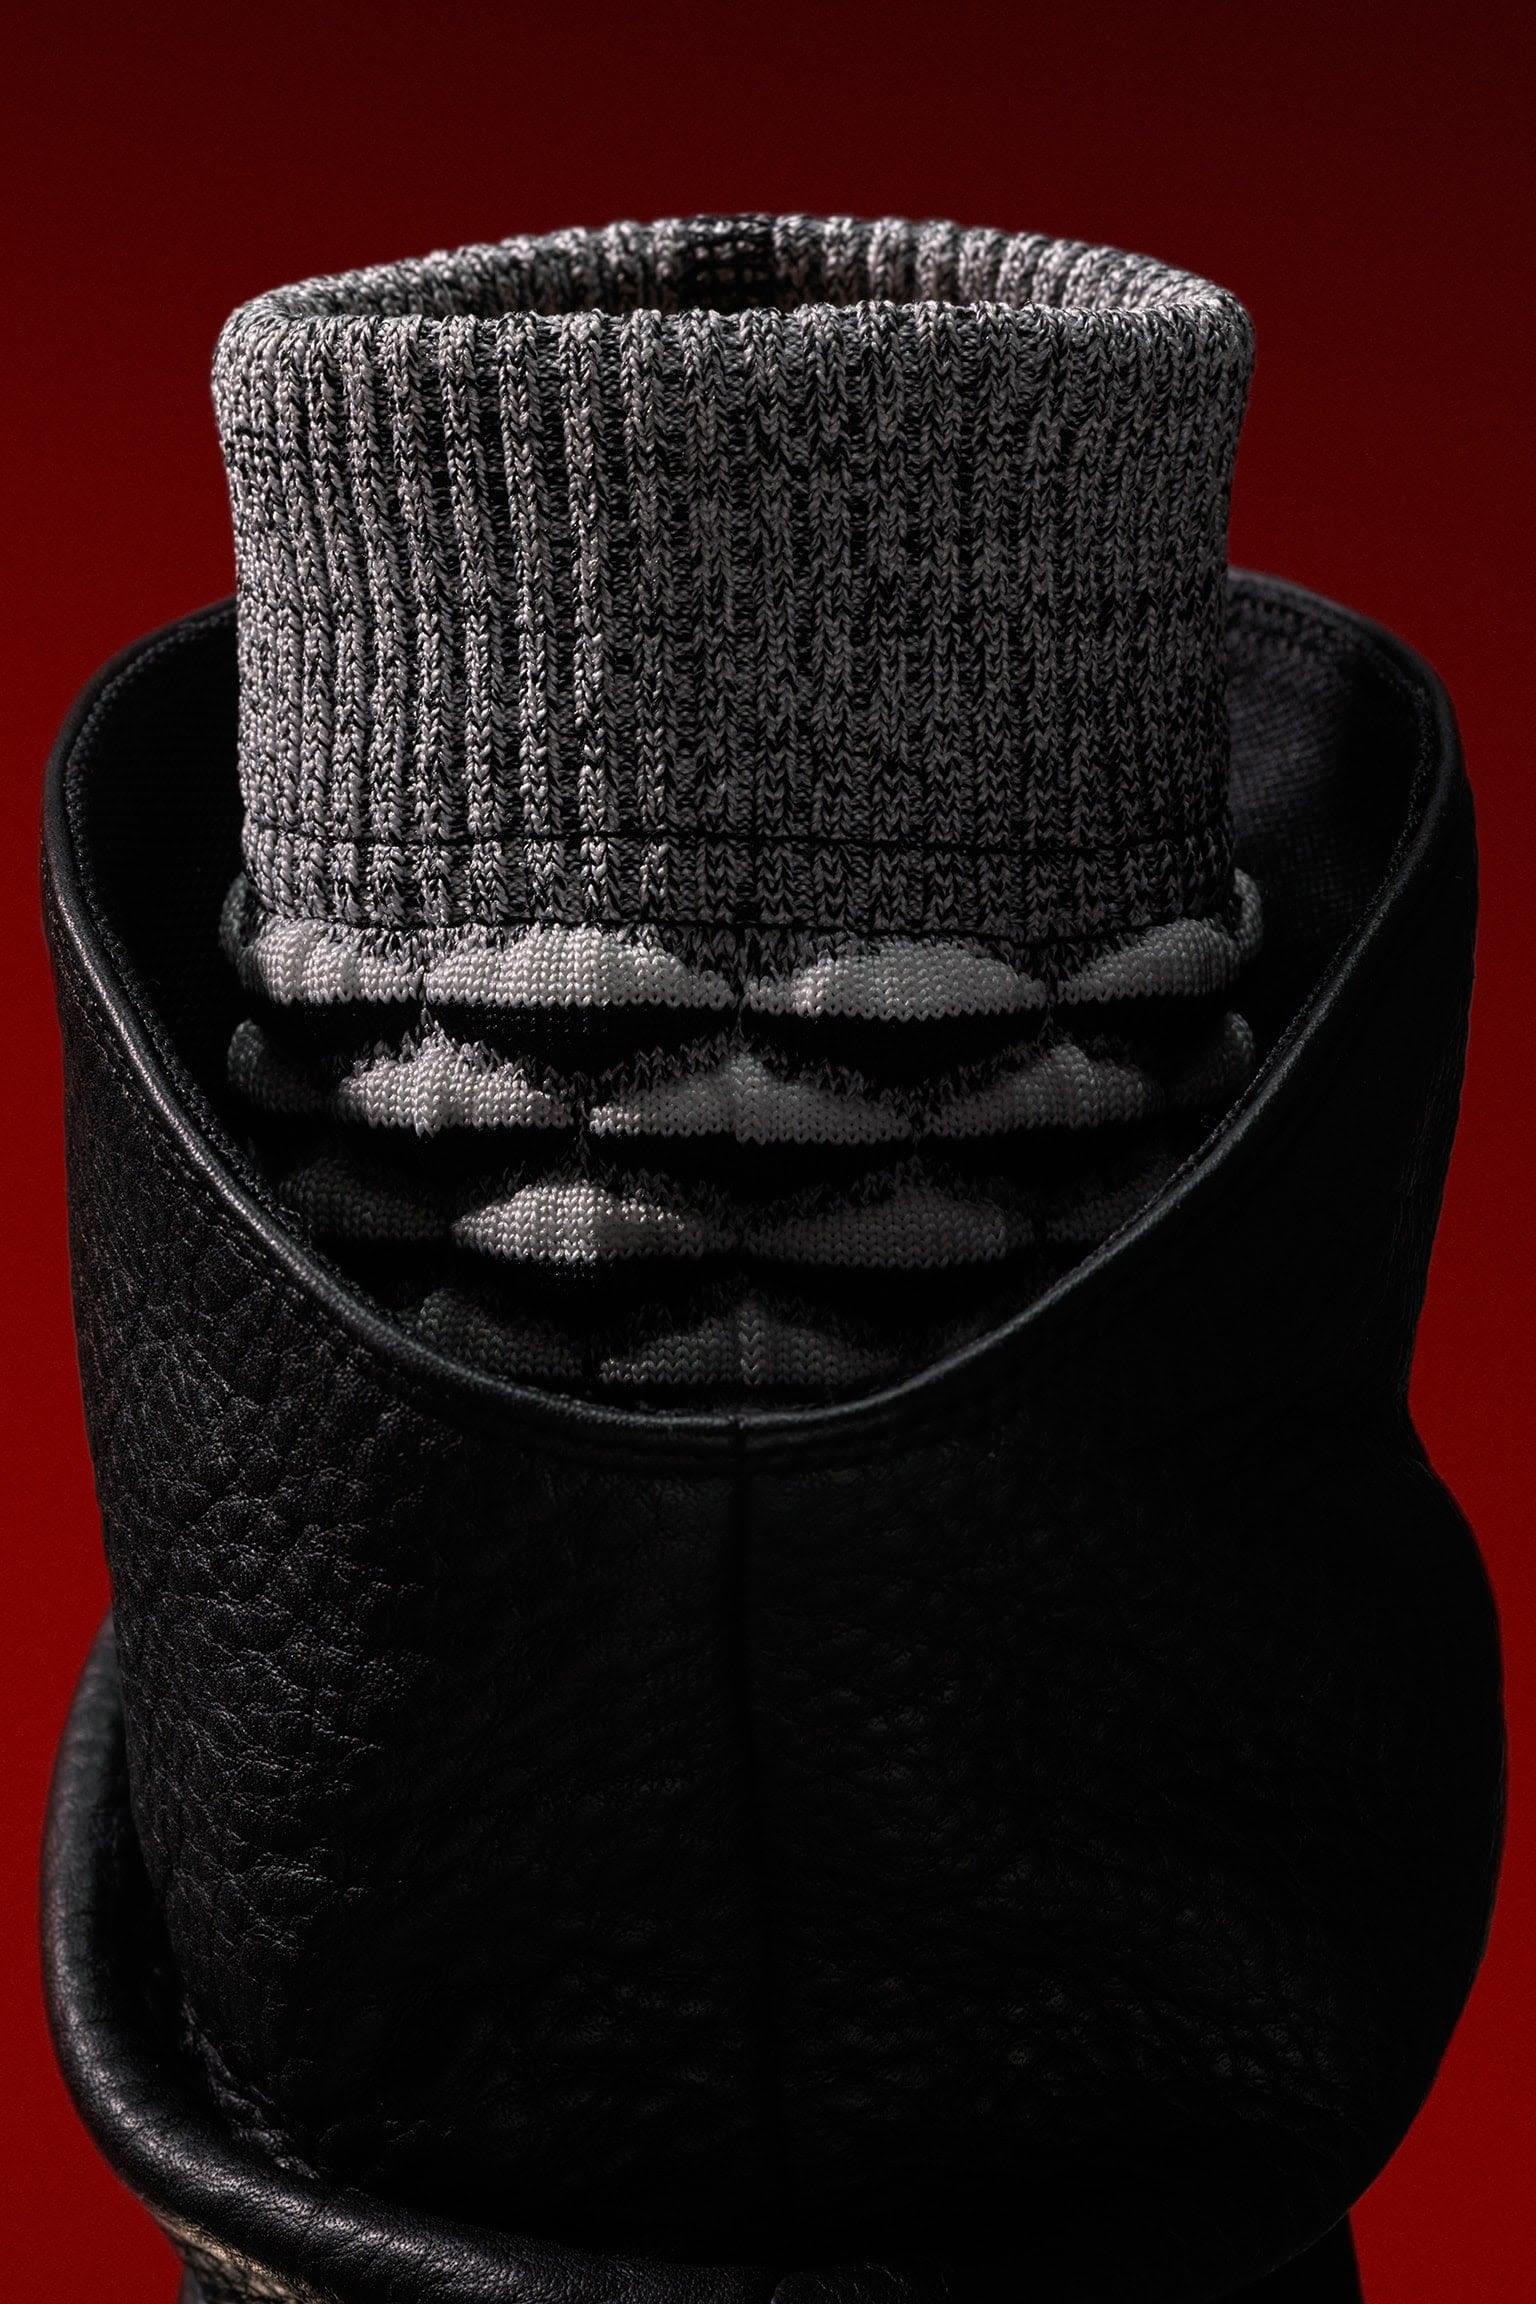 Dámská Nike Roshe Two Flyknit Hi Sneakerboot 'Black & White'. Datum uvedení na trh